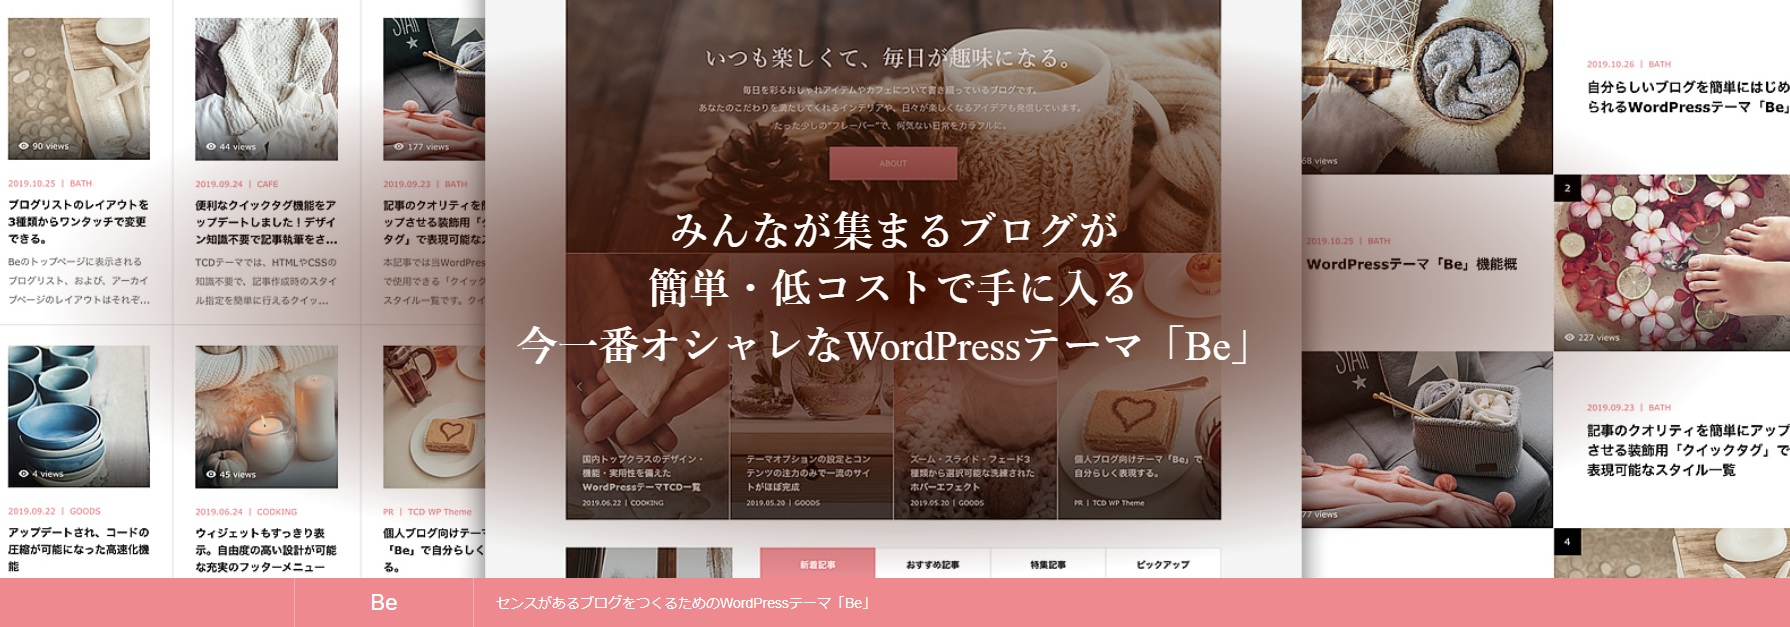 WordPressテーマ「Be」TCD076の評判・評価・口コミ【有料日本語ワードプレステンプレート】